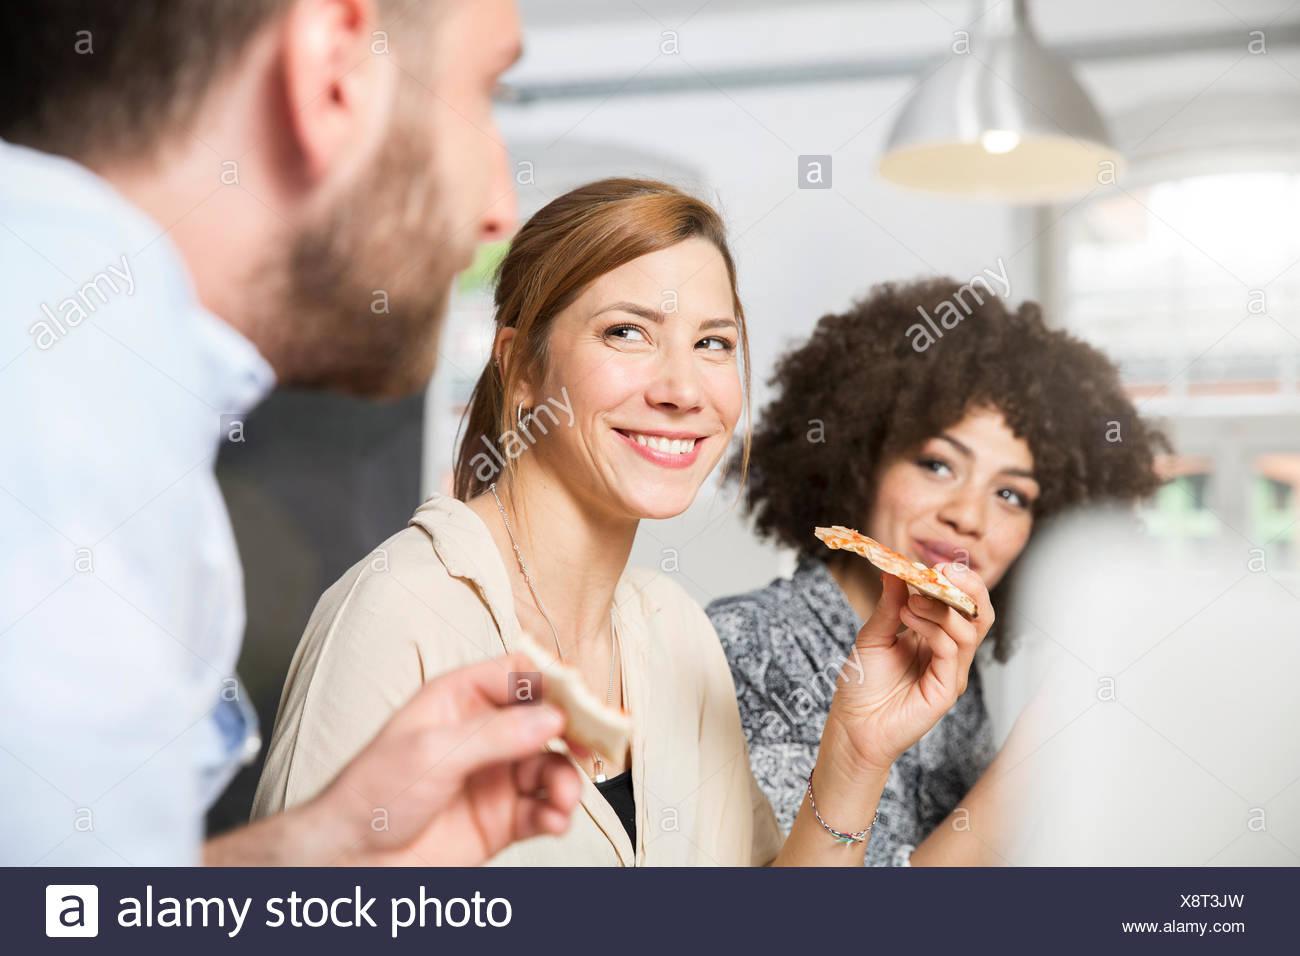 Drei Kollegen Im Buro Pizza Essen Stockfoto Bild 280812865 Alamy